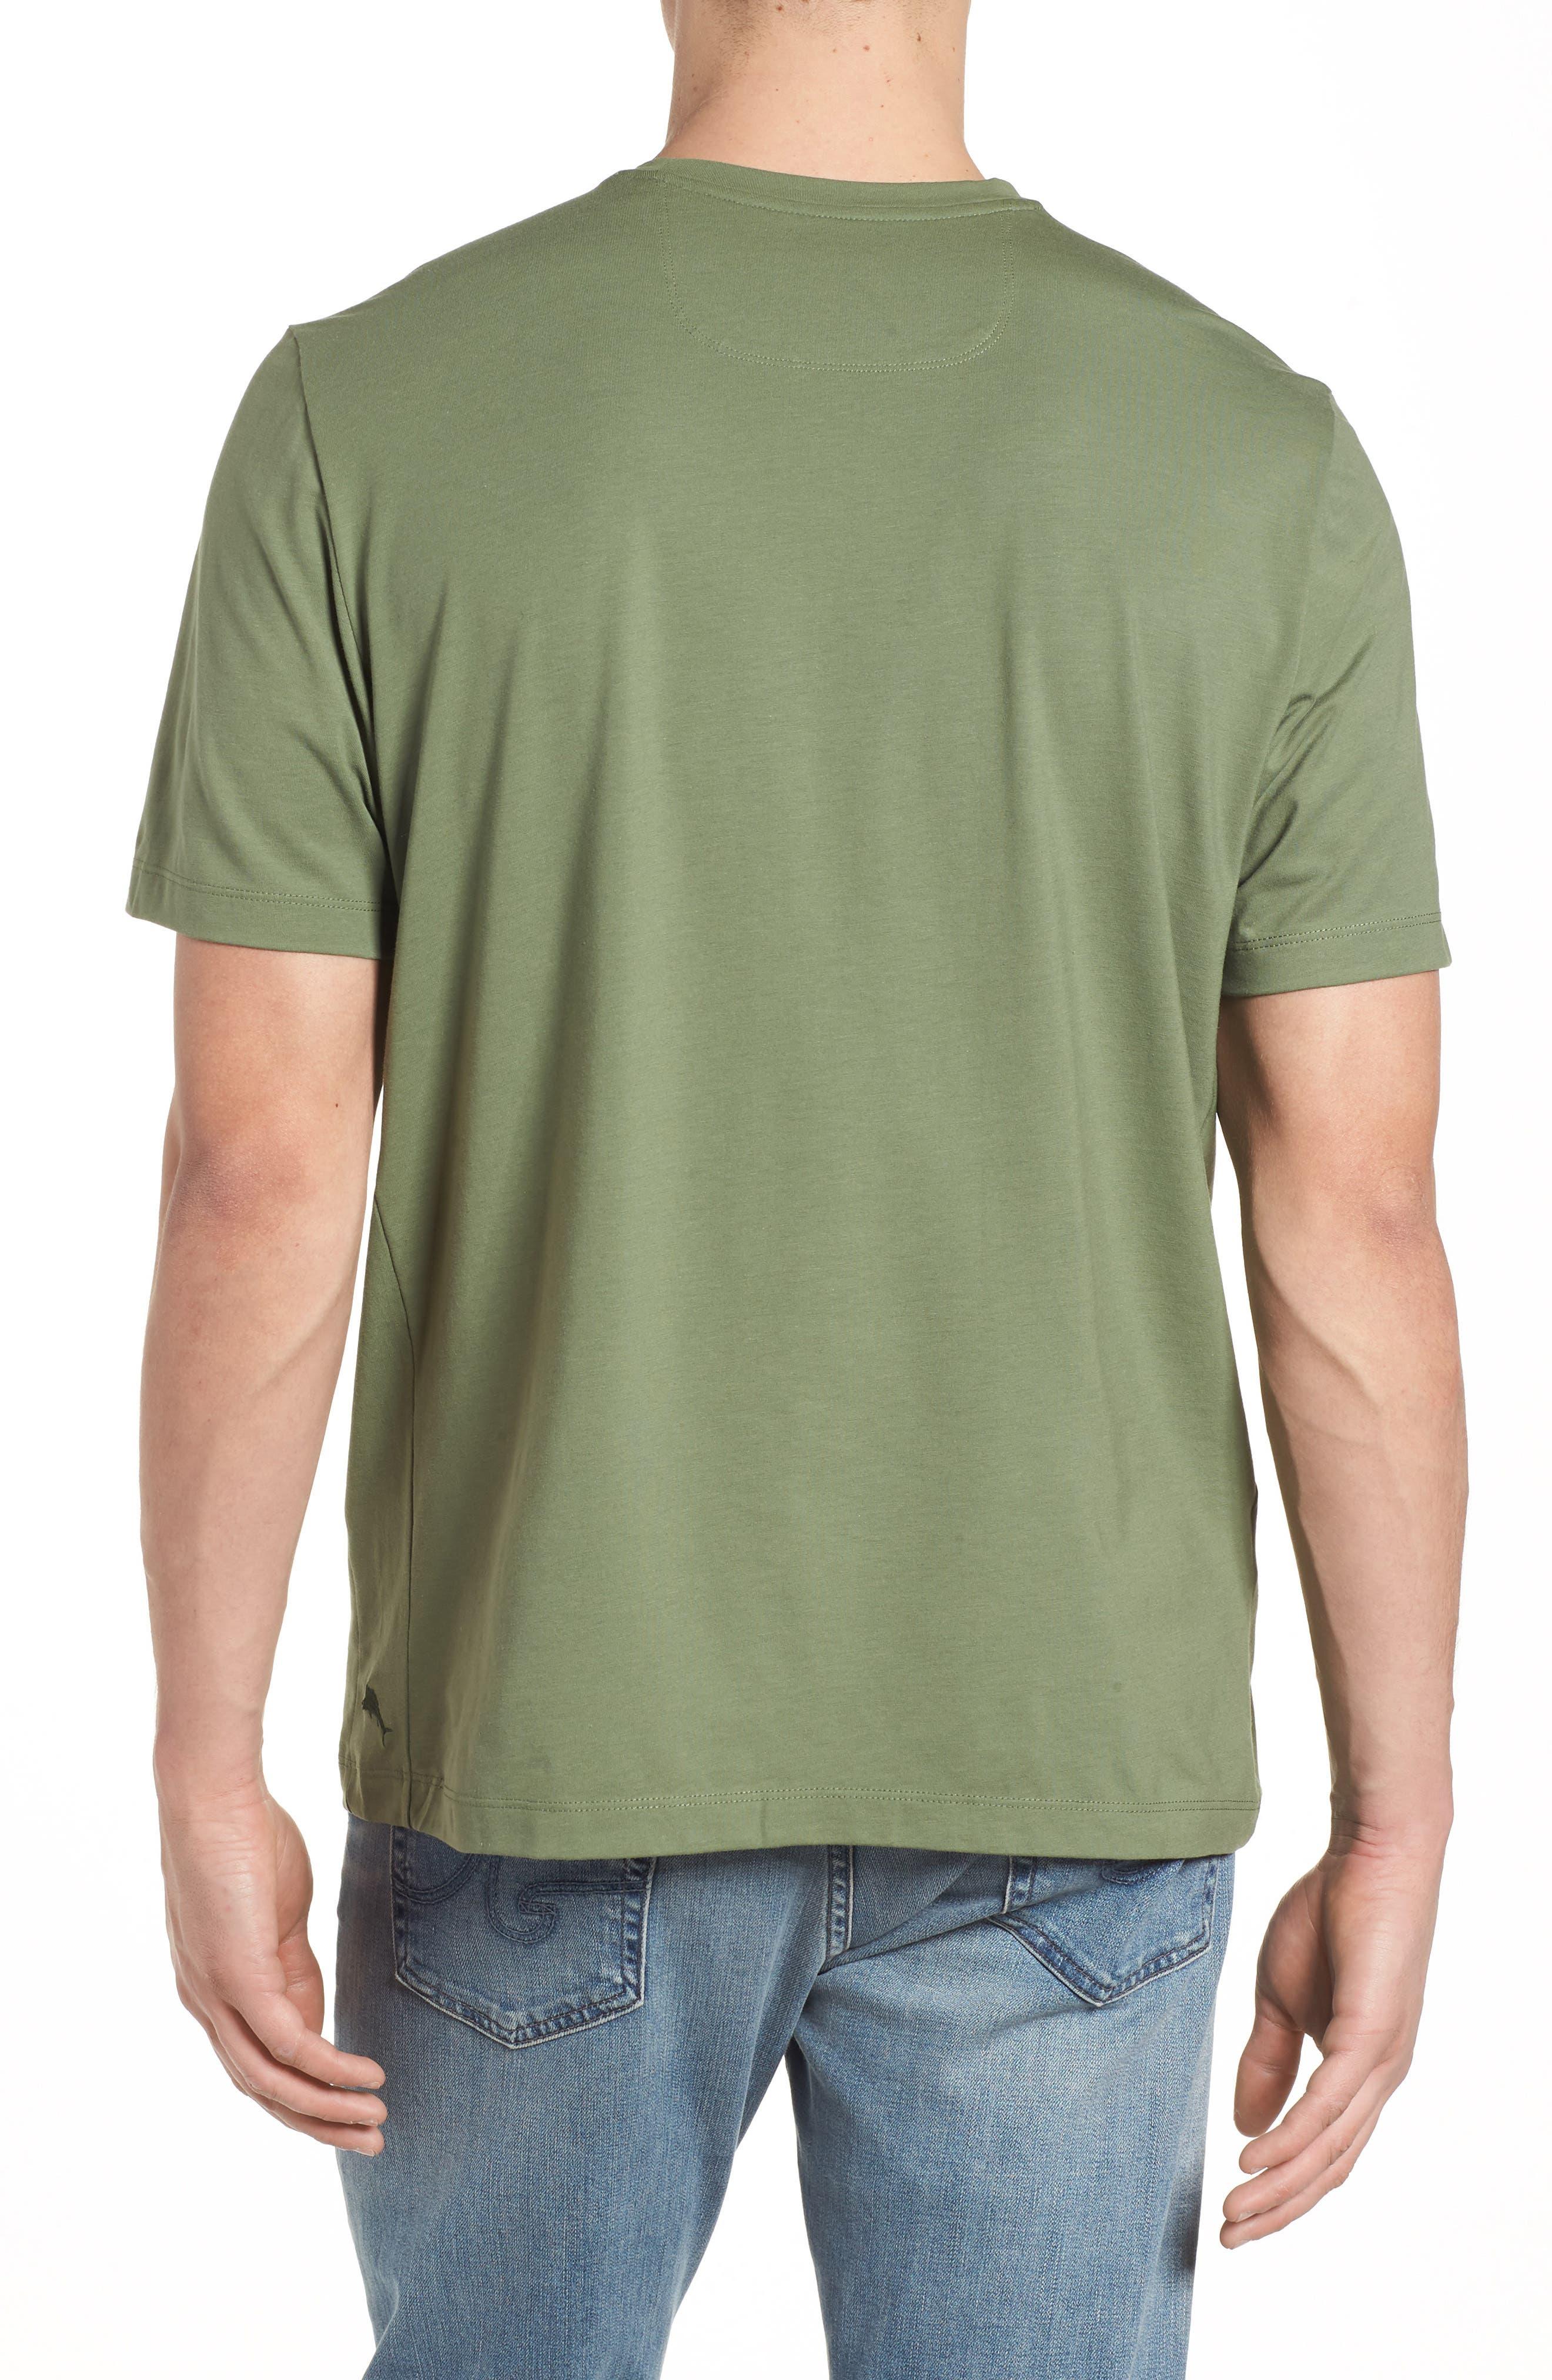 Tropicool T-Shirt,                             Alternate thumbnail 14, color,